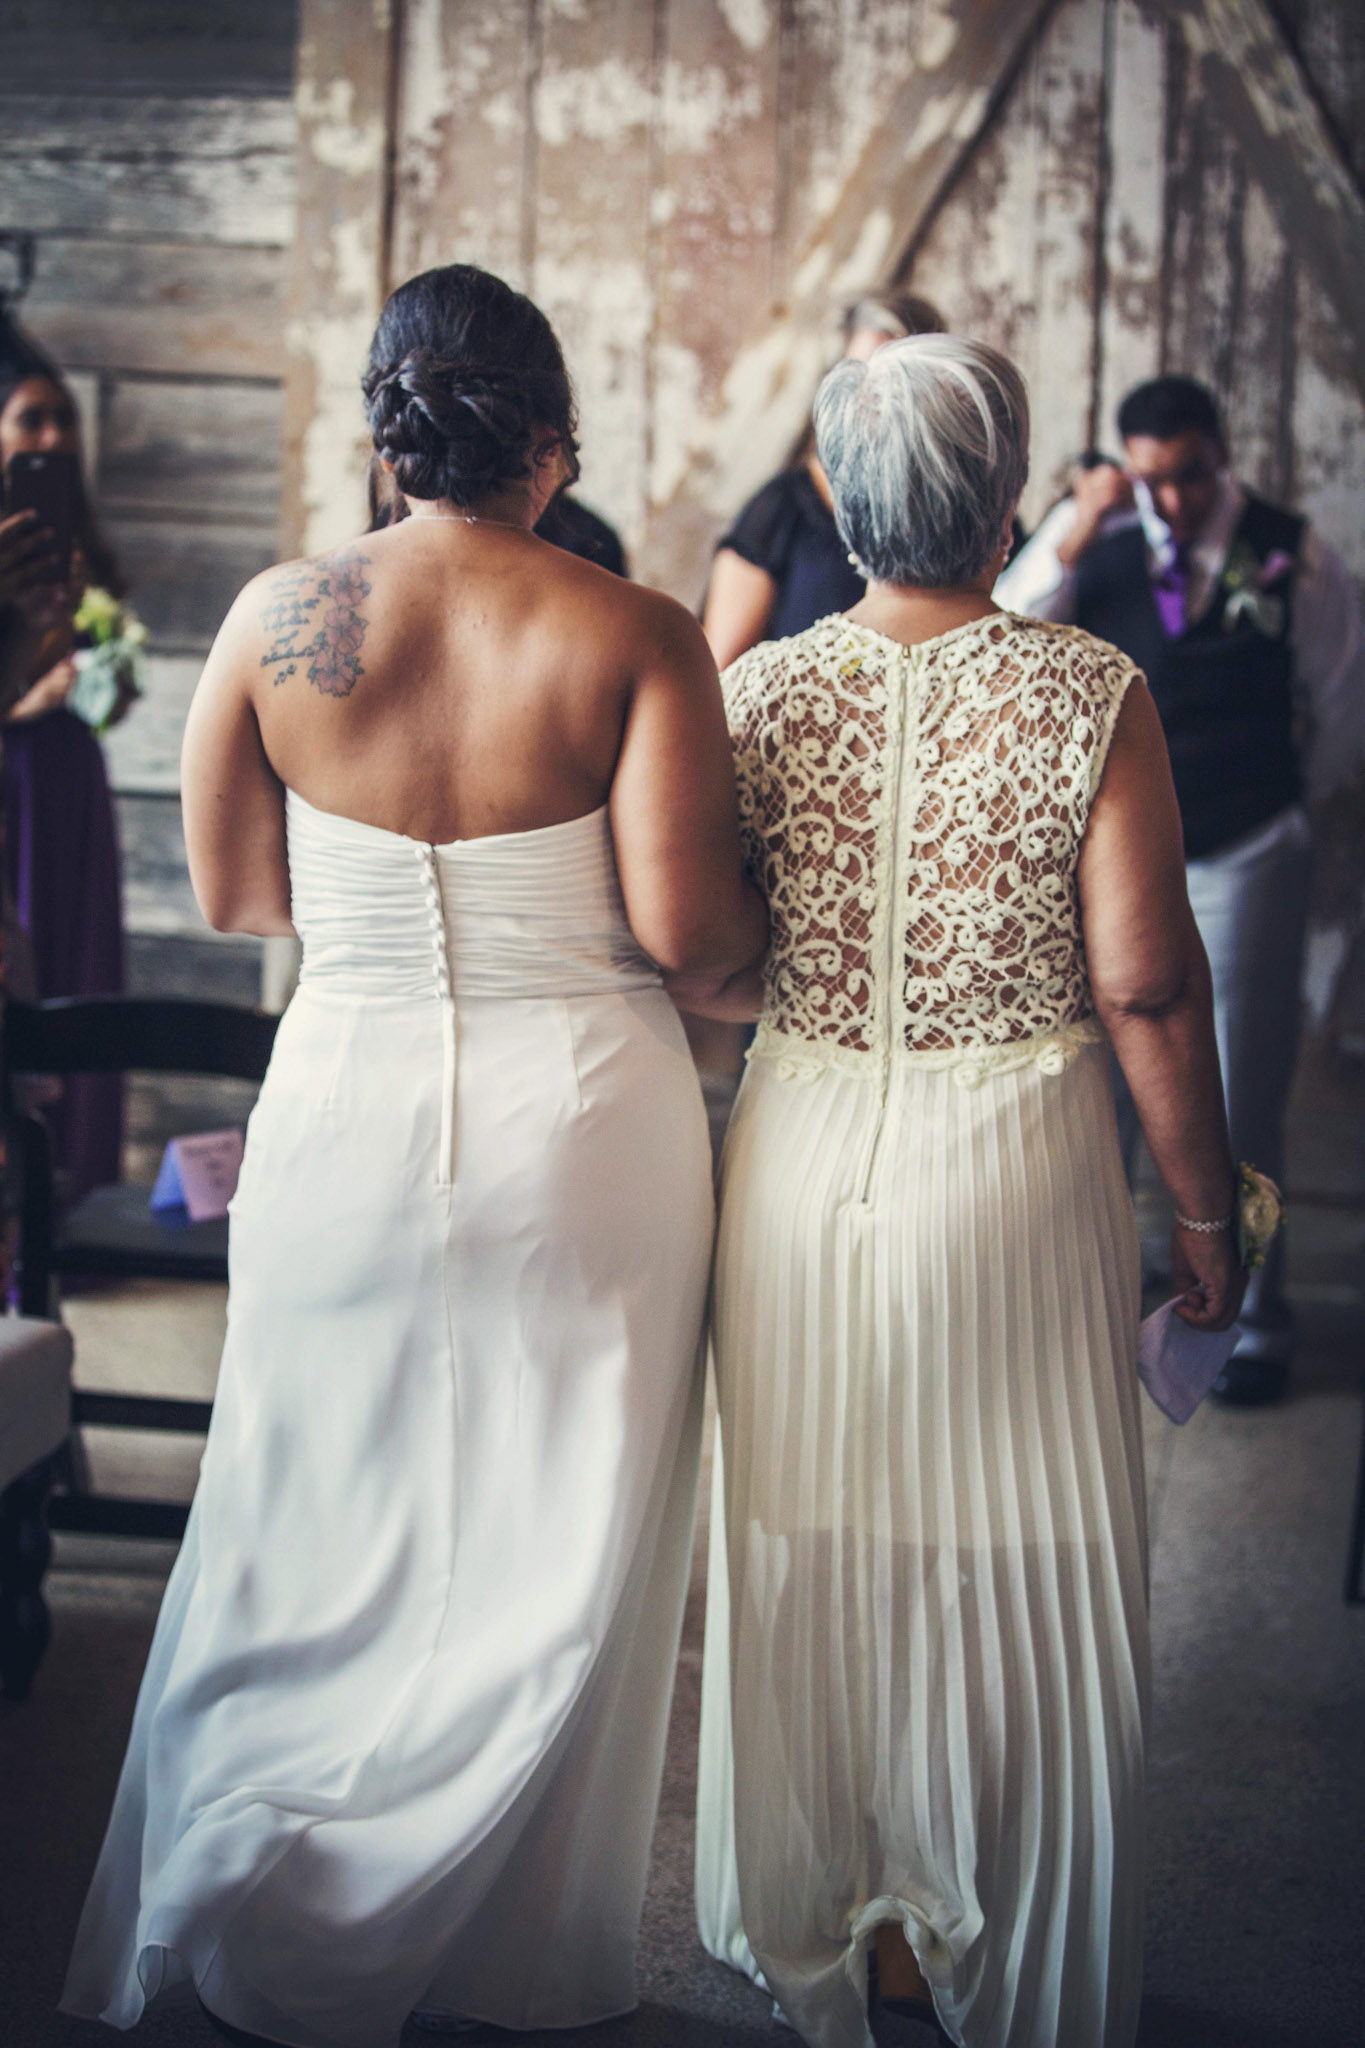 Kansas+City-Small+Wedding-Elope_Intimate_Ceremony_Mother's+Day_3.jpg